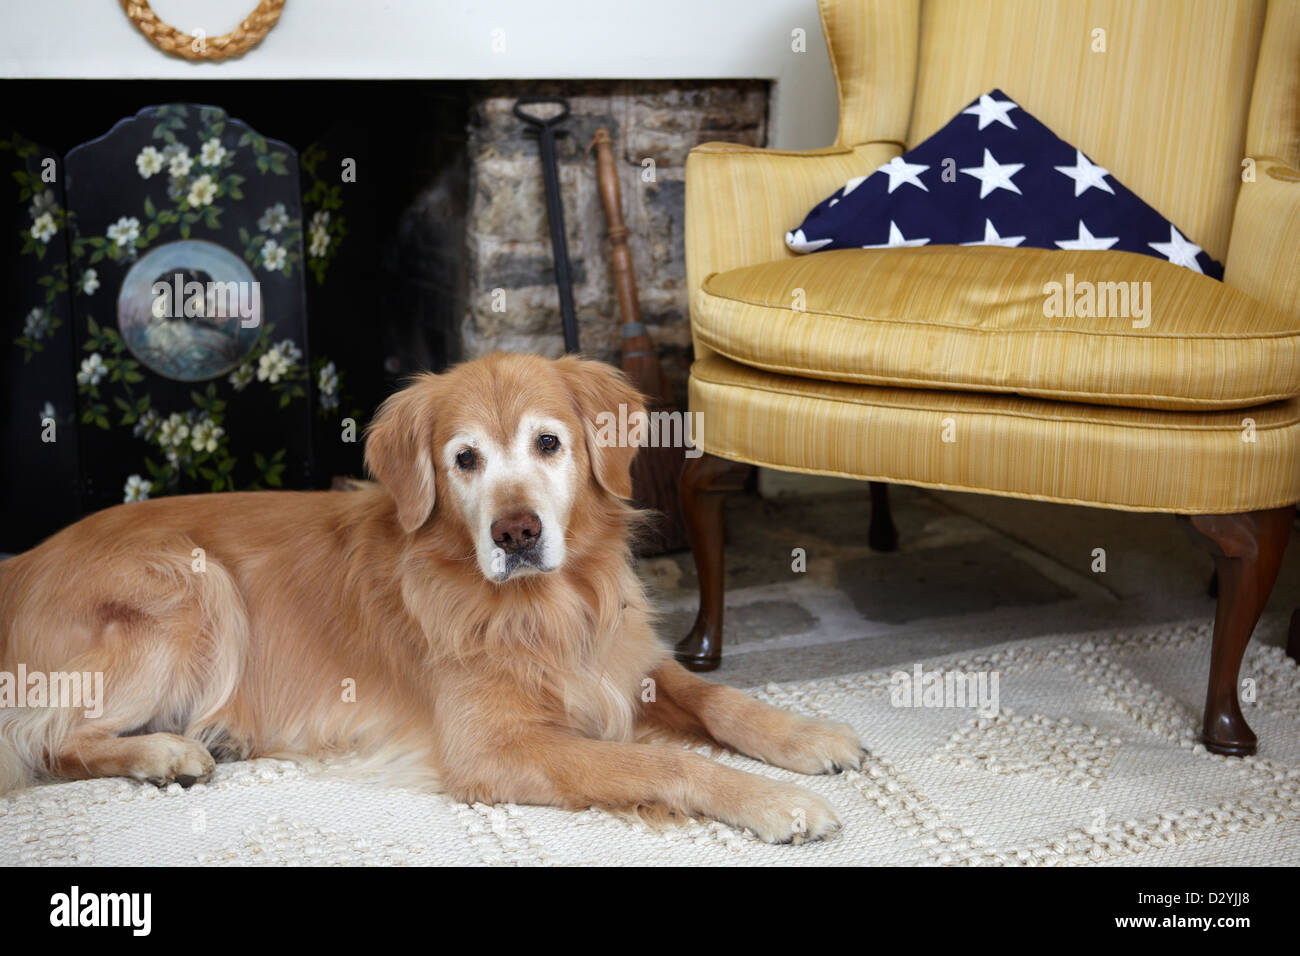 Loyal Golden Retriever dog with deceased Veteran, American flag. - Stock Image